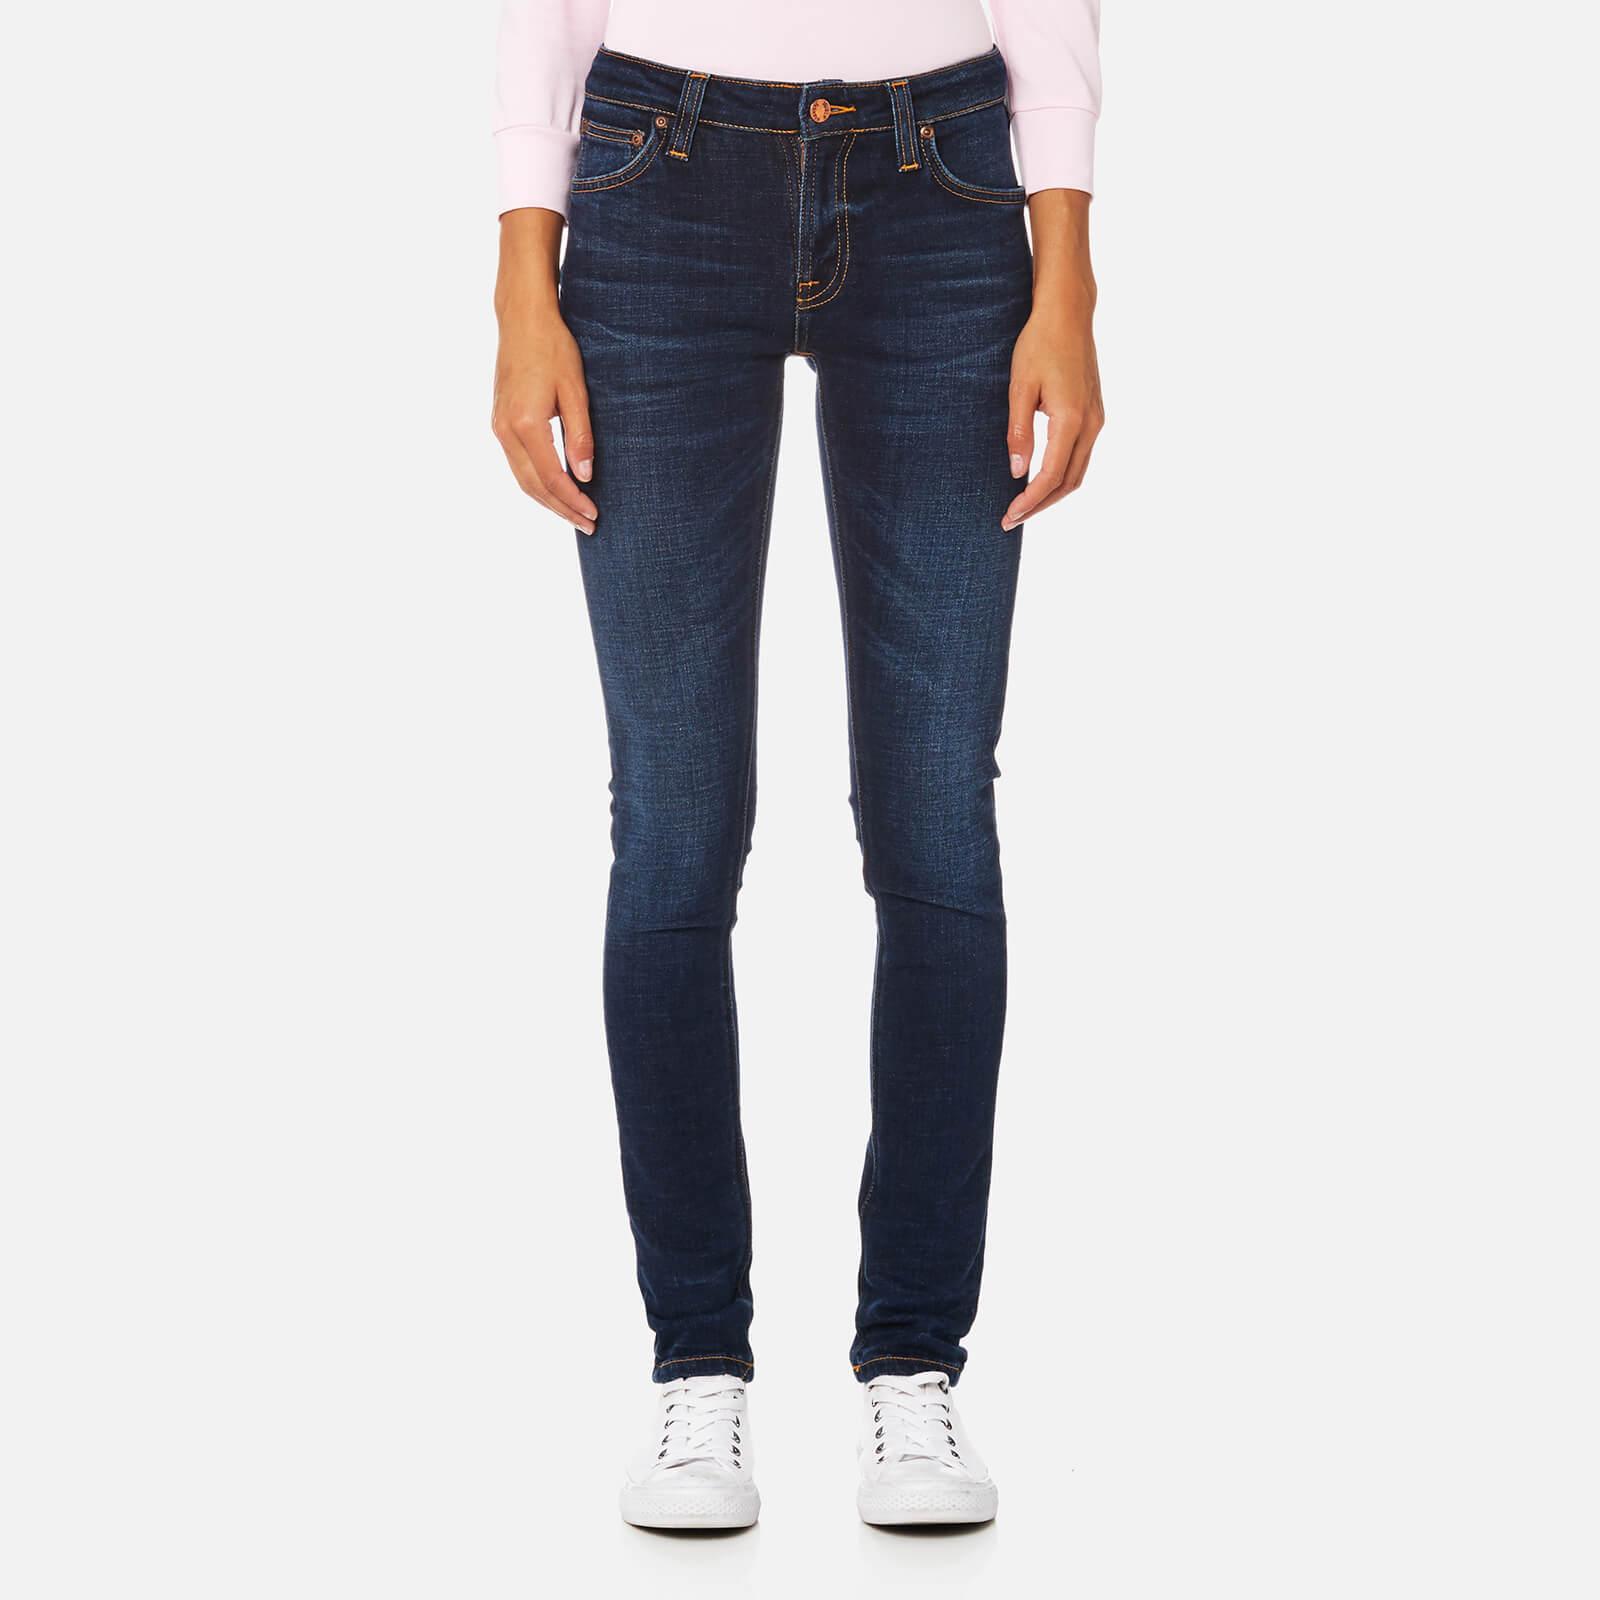 f8cf0de764ae Nudie Jeans Women s Skinny Lin Jeans - Dark Blue Authentic - Free UK ...